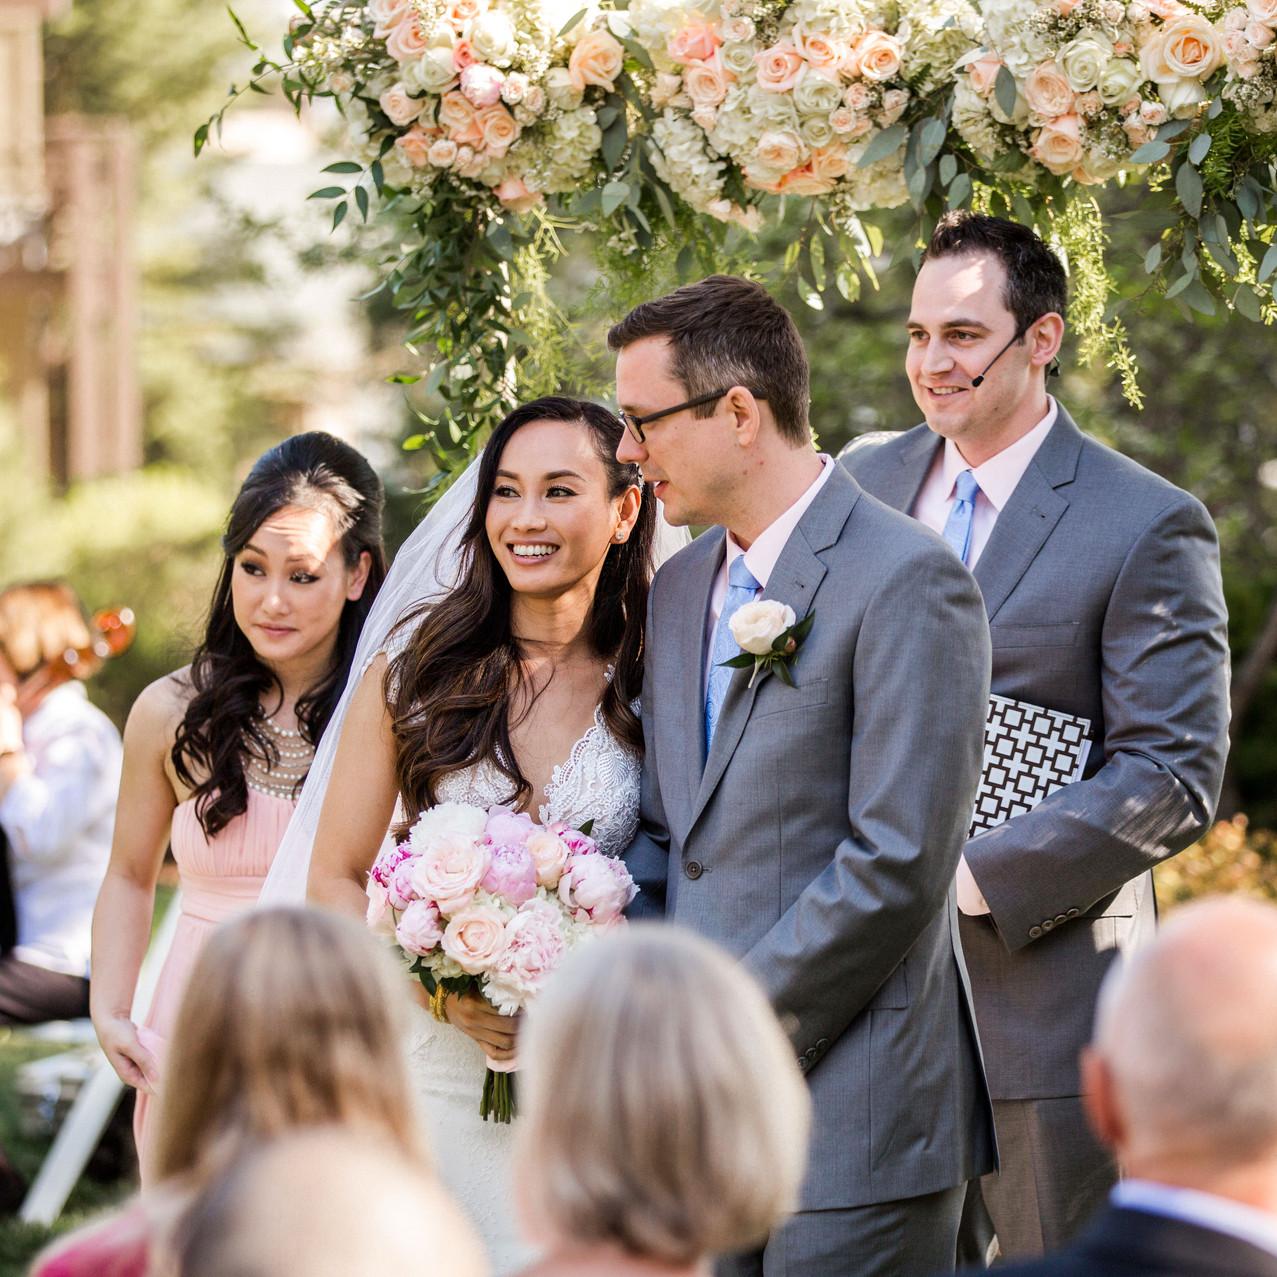 A-Floral-Affair-HYATT-LAKE-TAHOE-WEDDING-FLORIST (13)